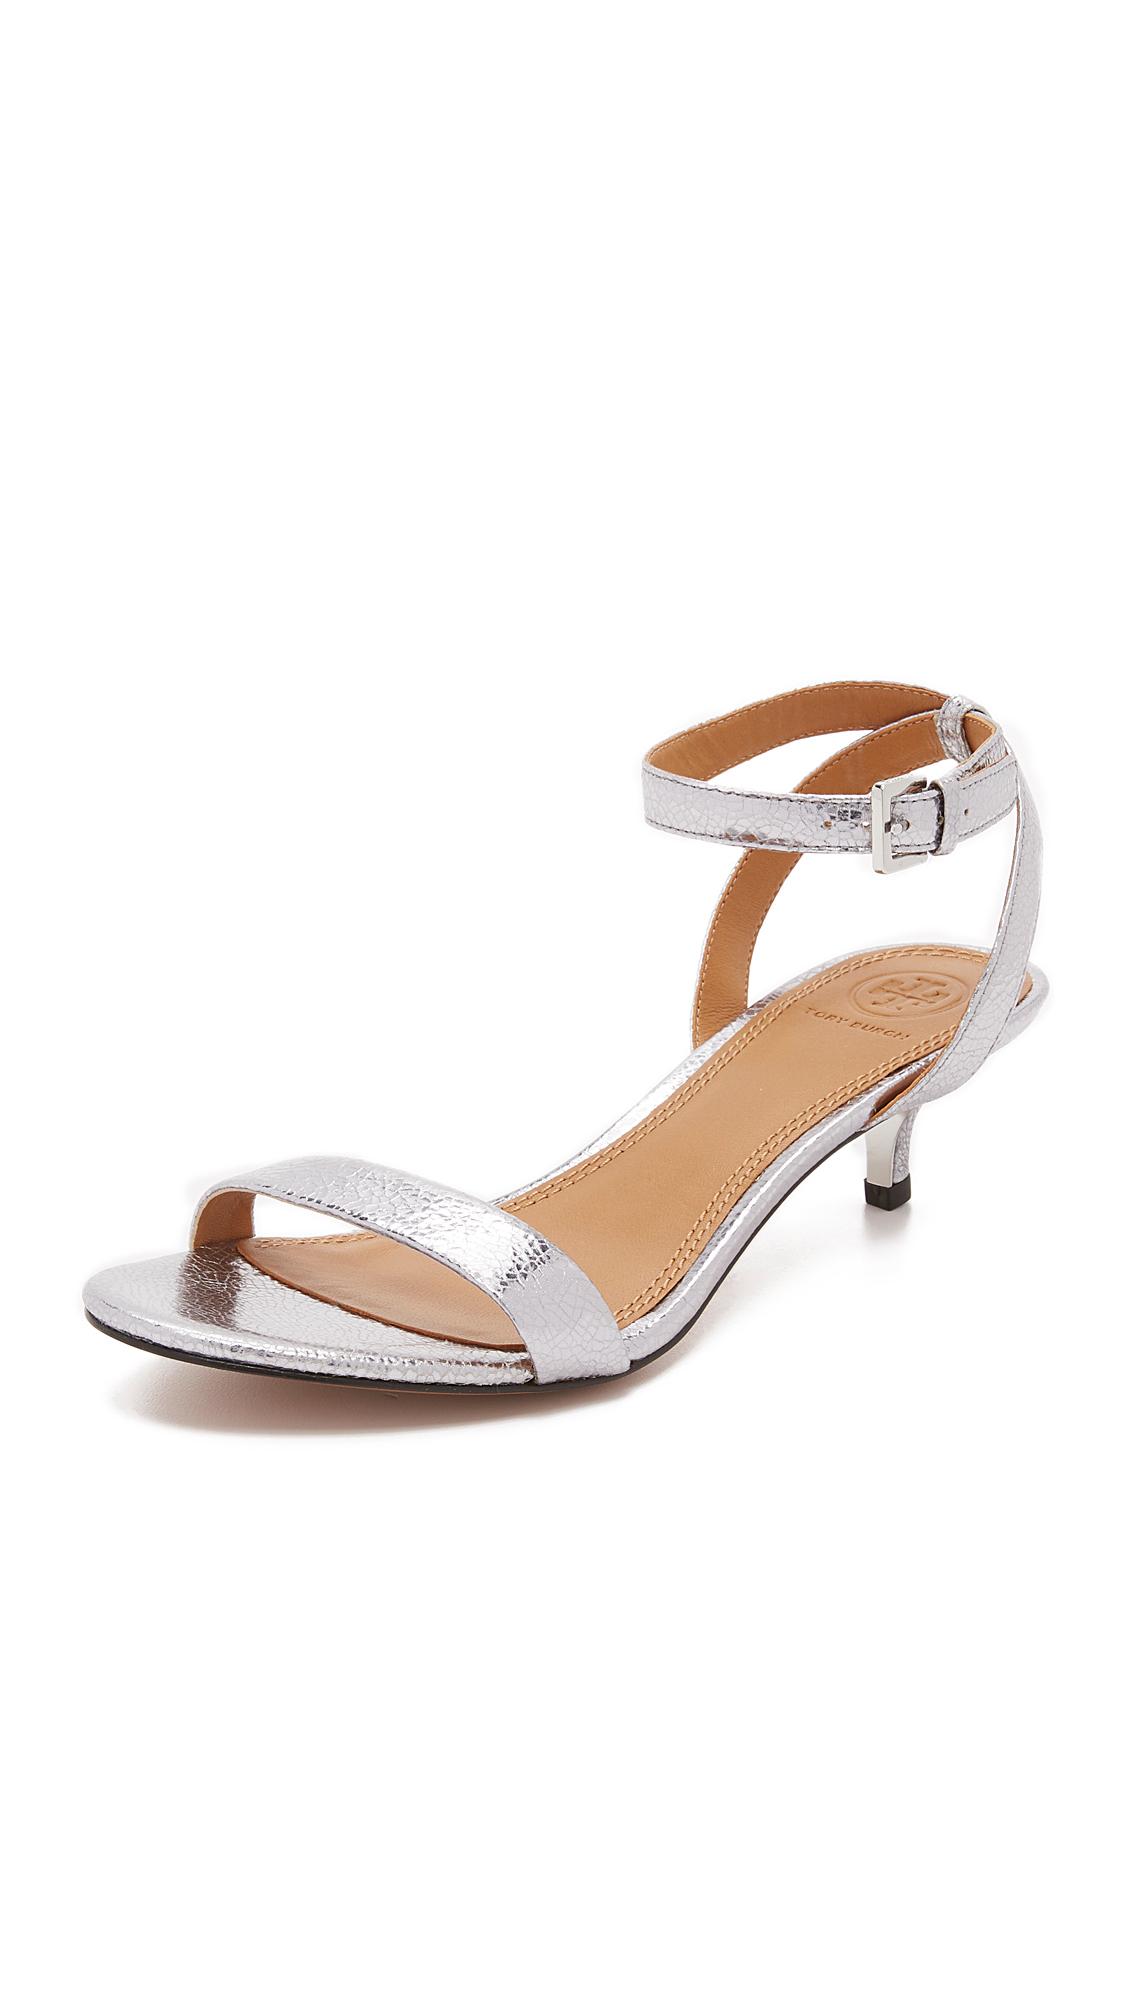 8331dc6e667 Lyst - Tory Burch Elana Metallic Sandals in Metallic